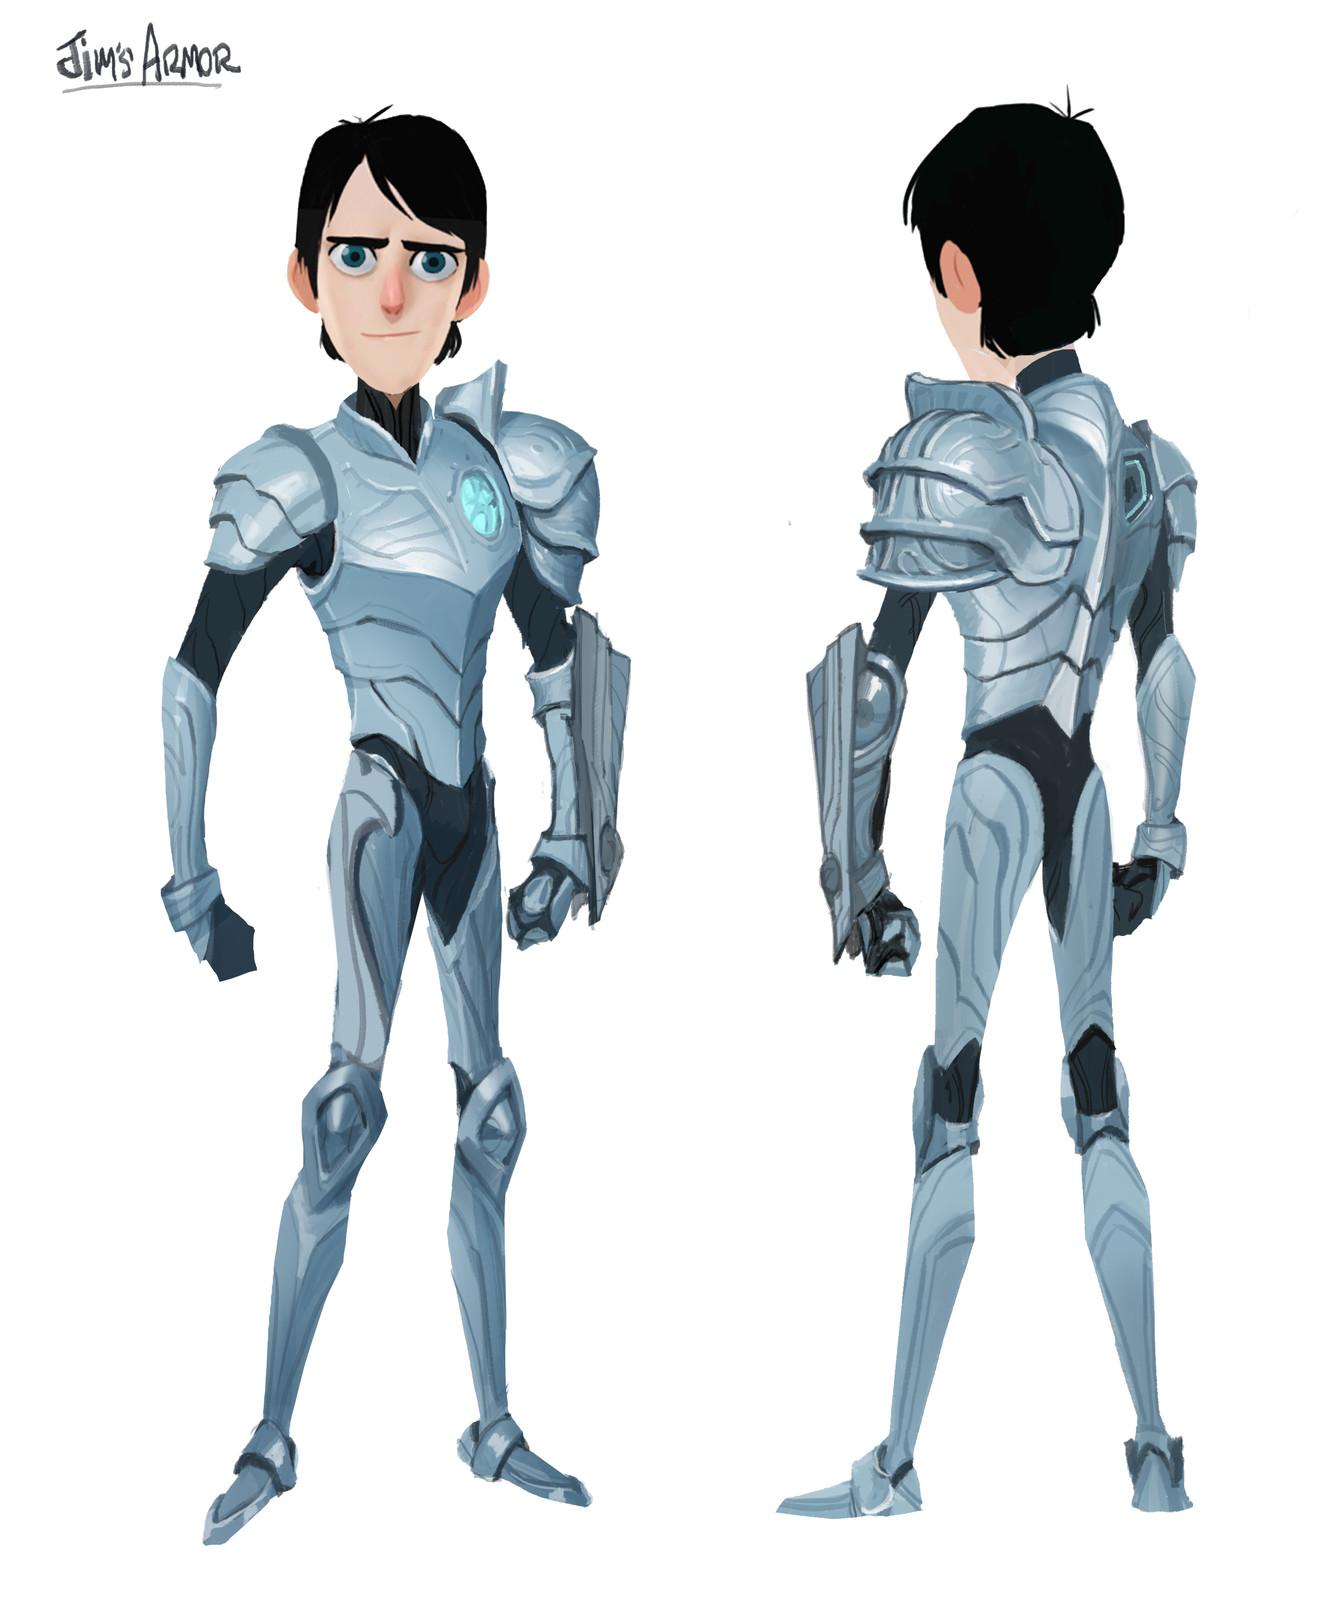 Trollhunters, Jim's Armor